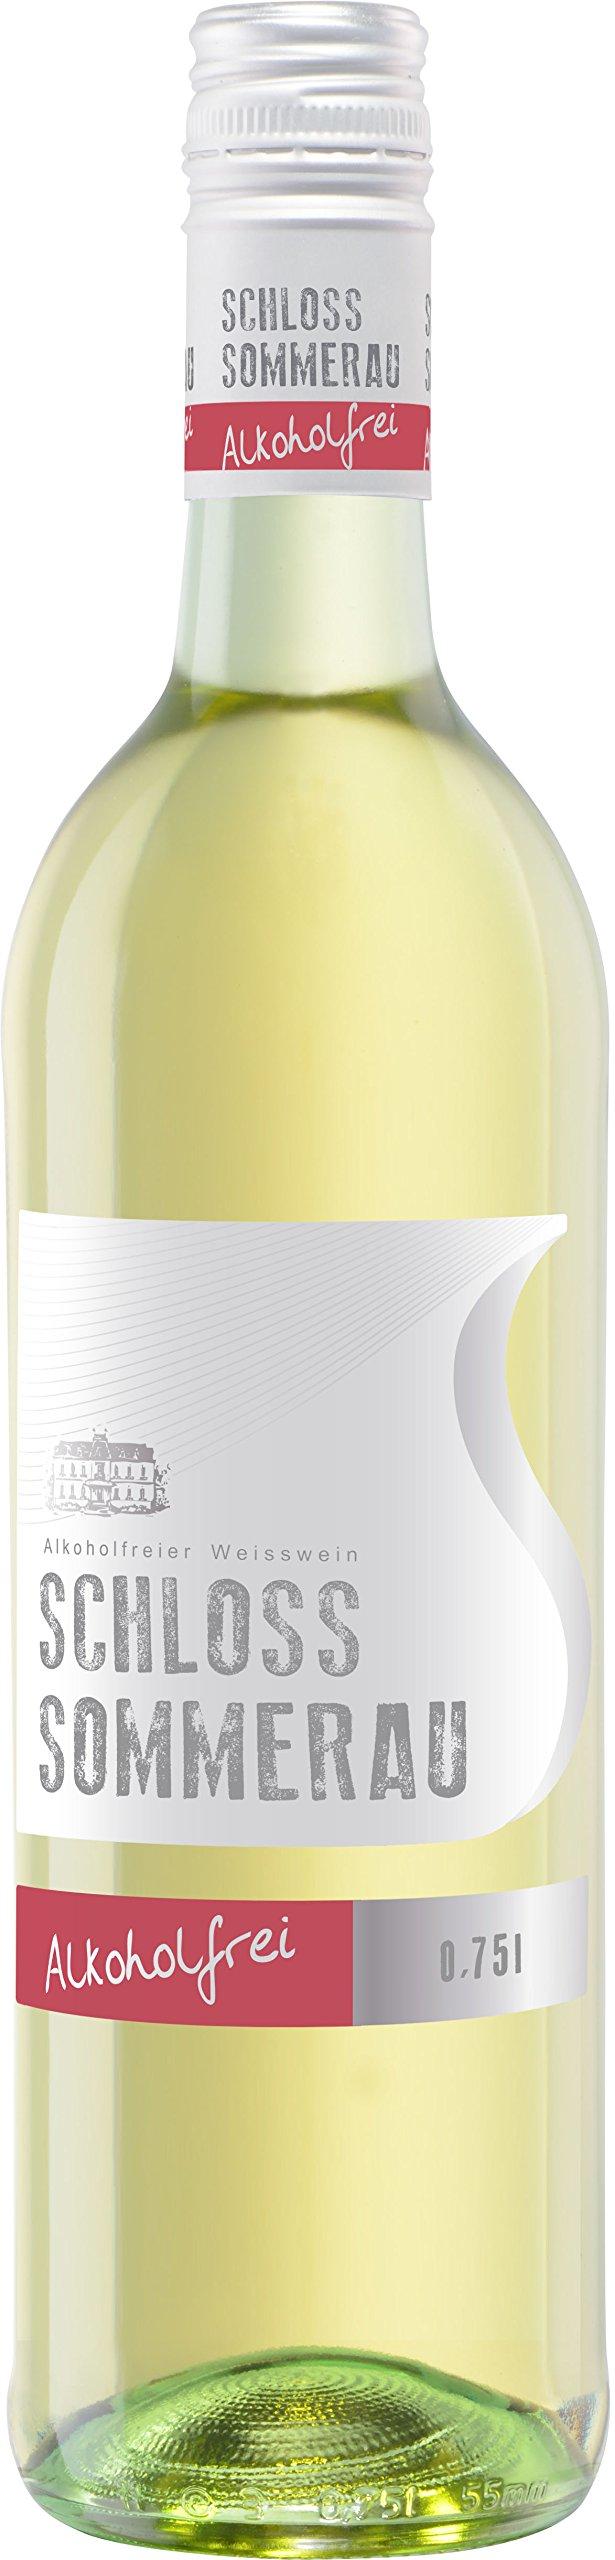 Schloss-Sommerau-Alkoholfrei-1-x-075-l